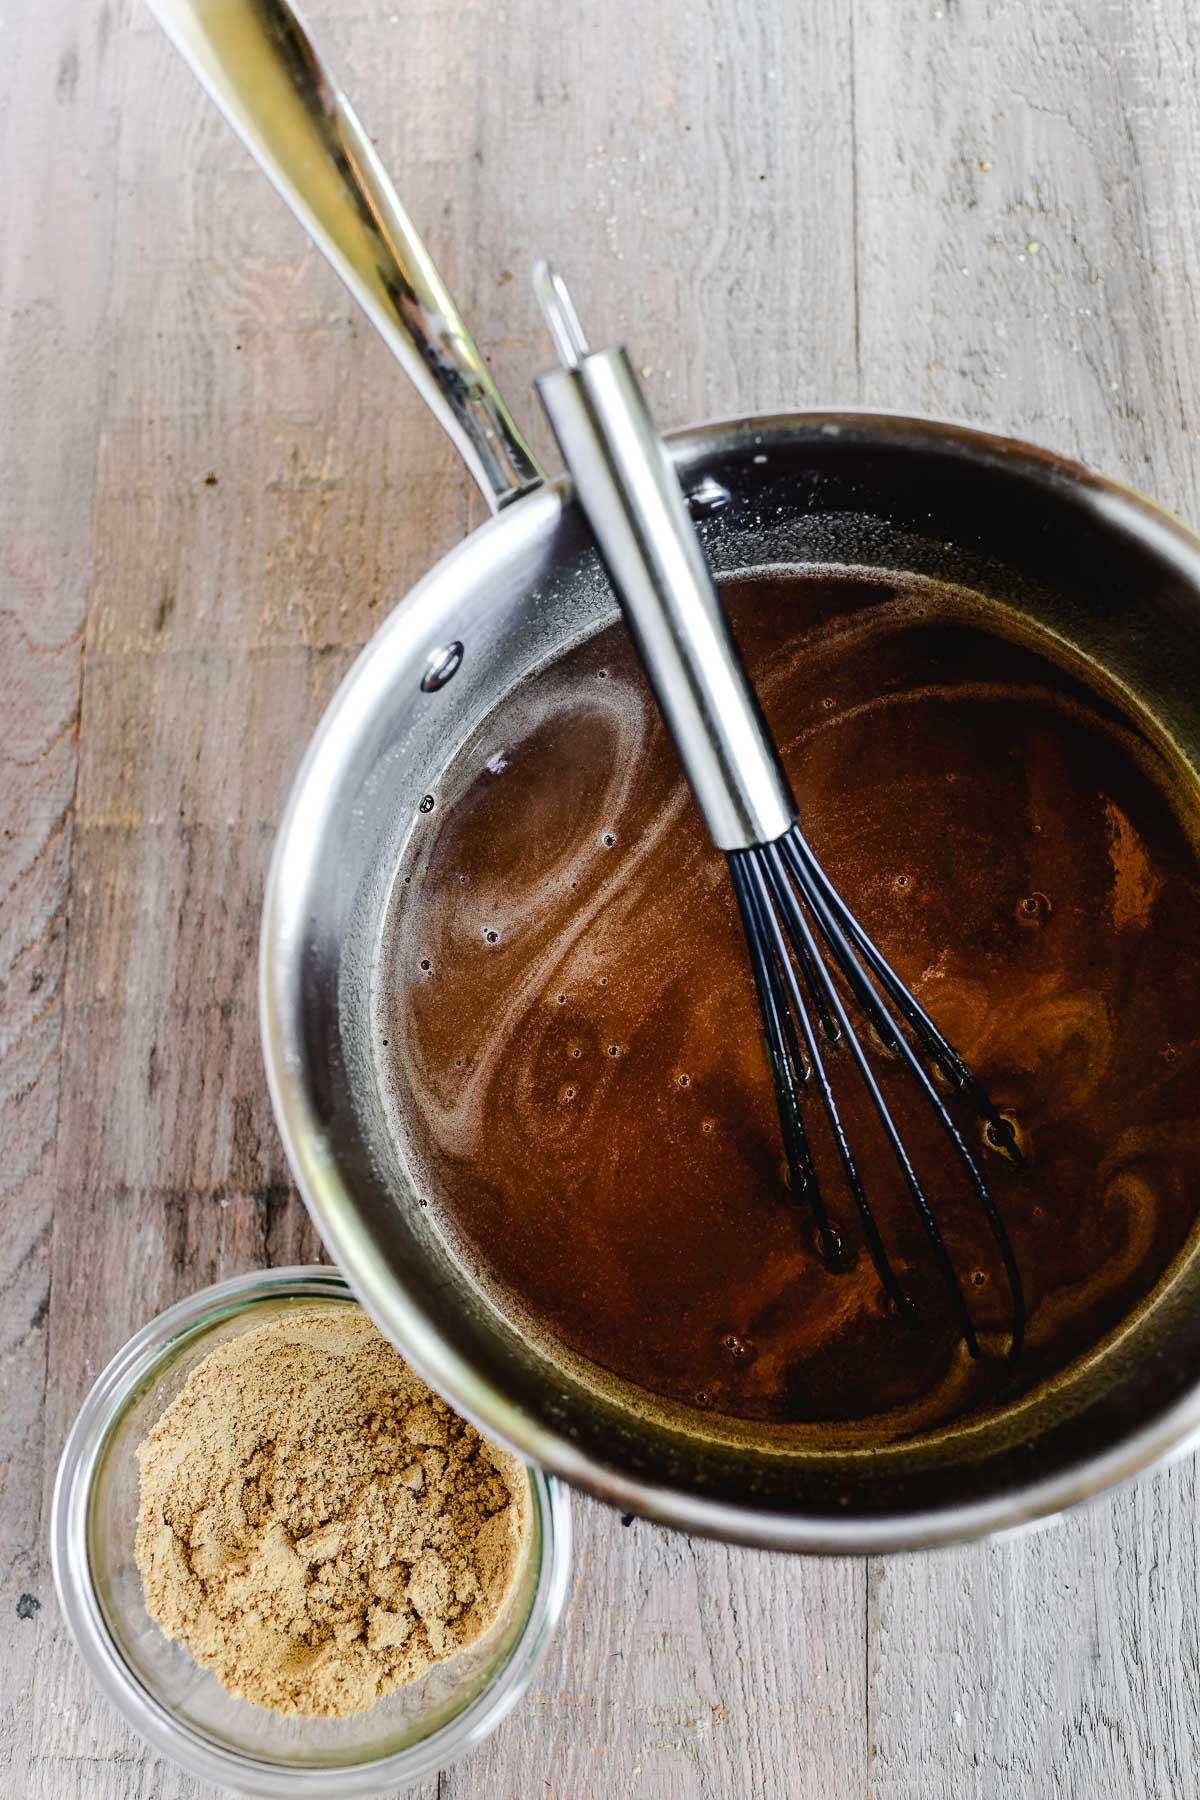 Thickening Sauerbraten gravy with crushed gingersnaps